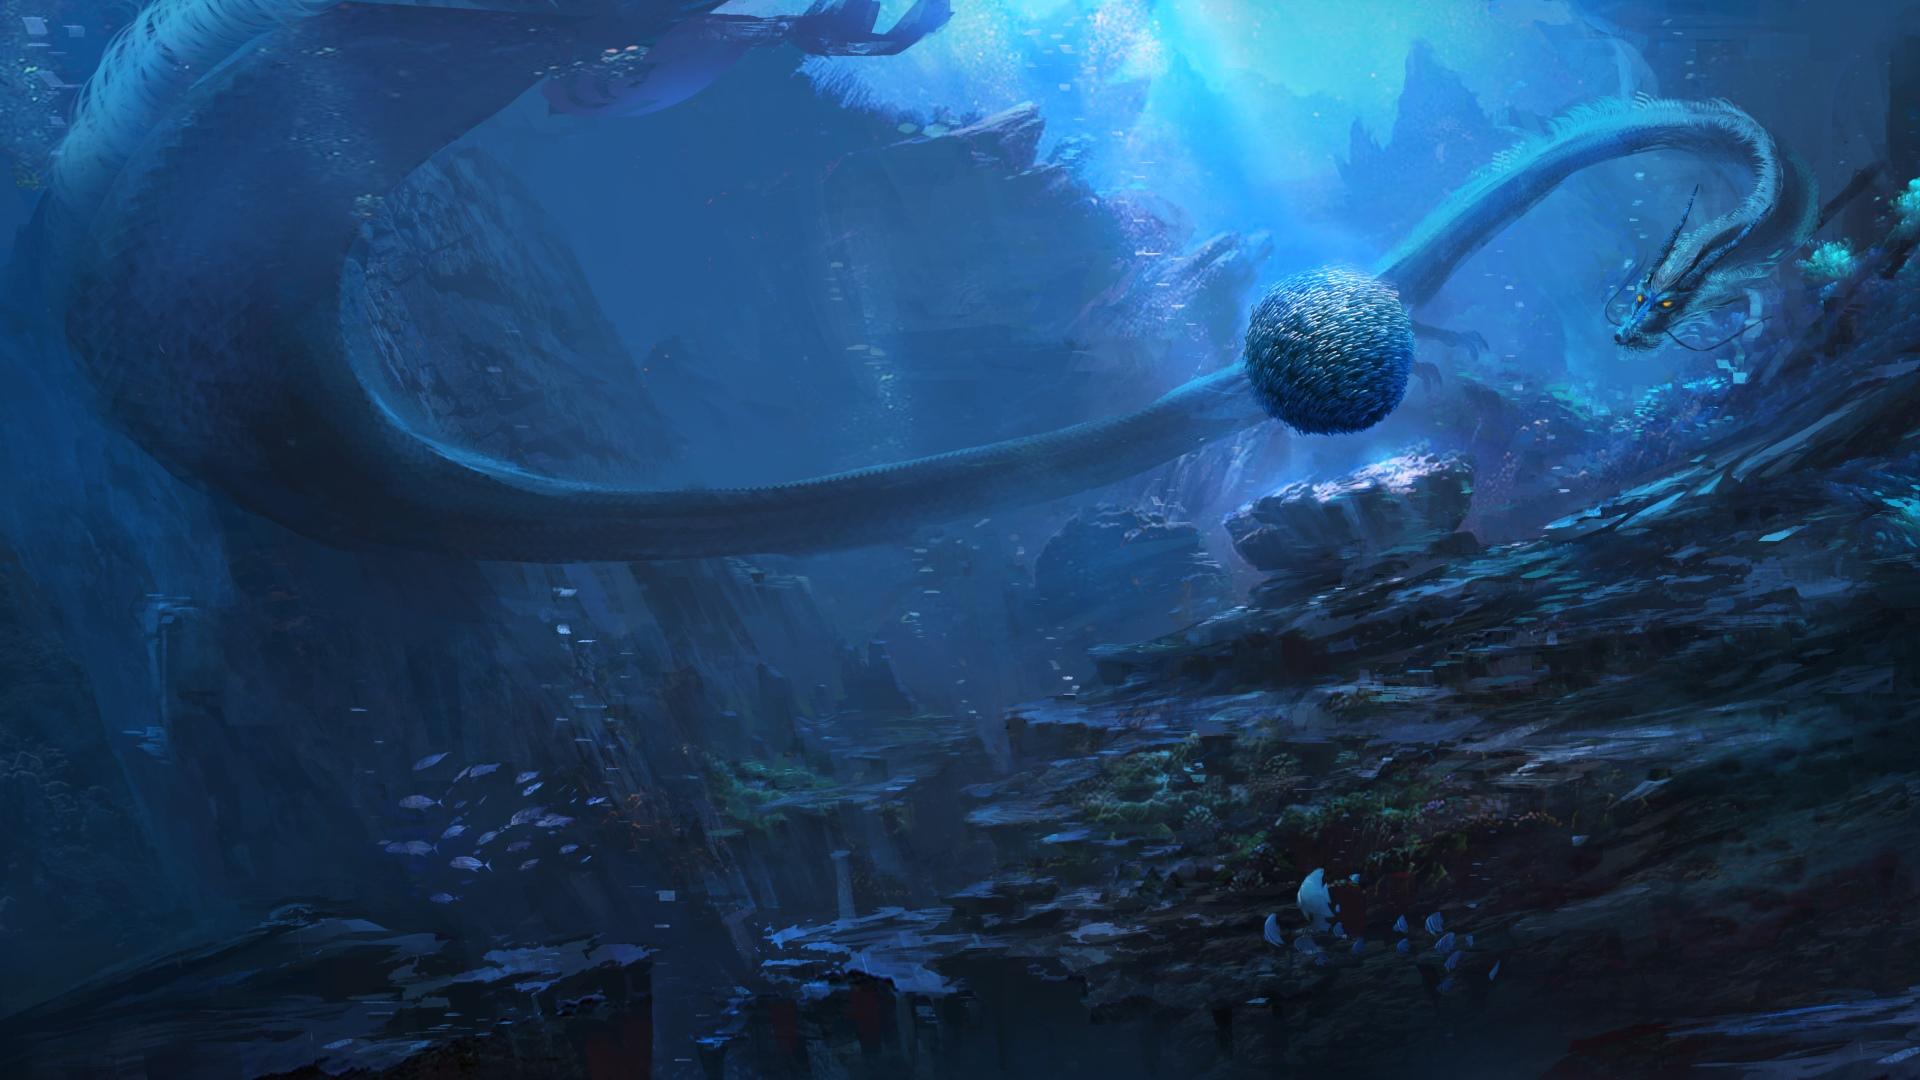 General 1920x1080 digital art underwater fantasy art Sea Serpent